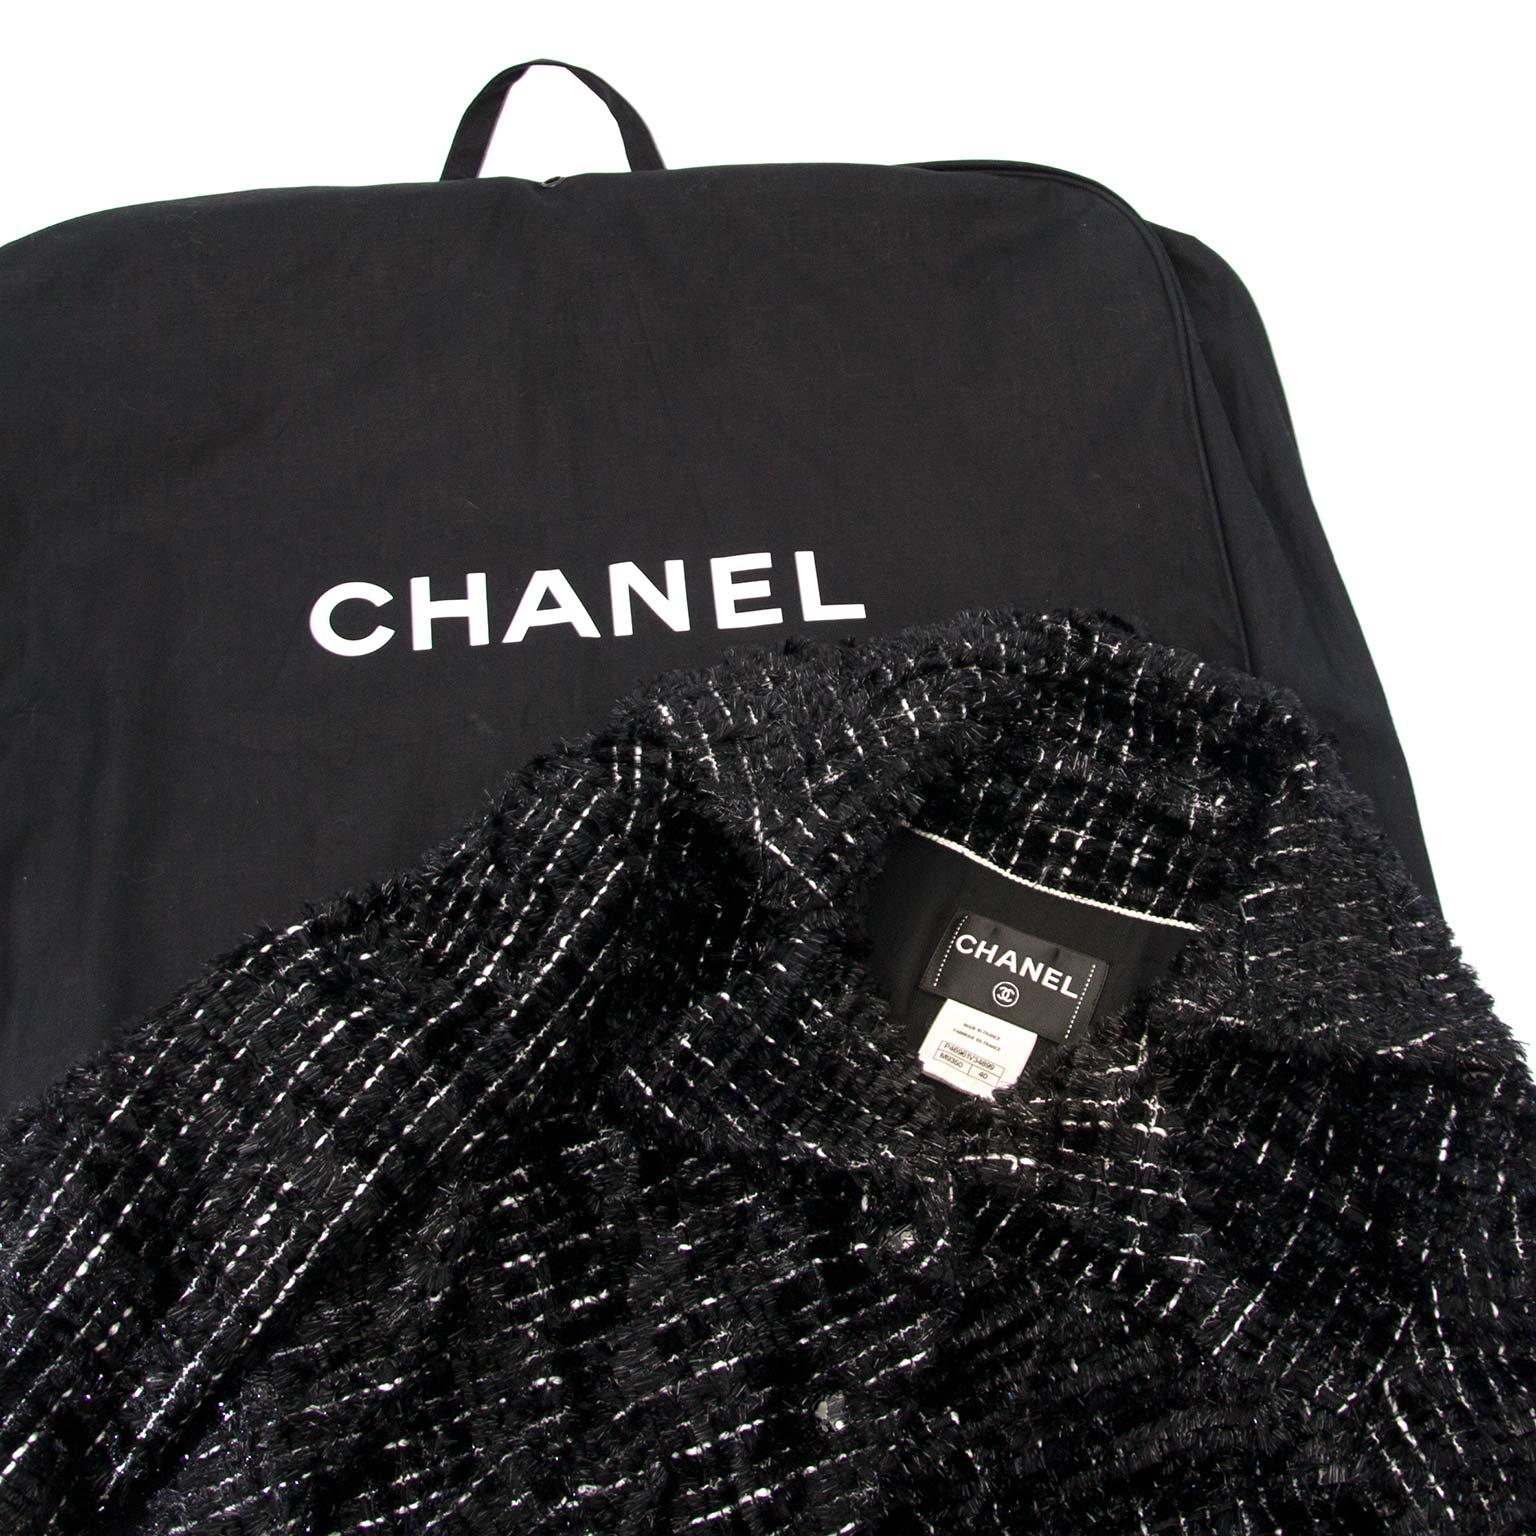 acheter en ligne chez labellov.com Chanel Black Vest Model Chanel Fashion Week 2013